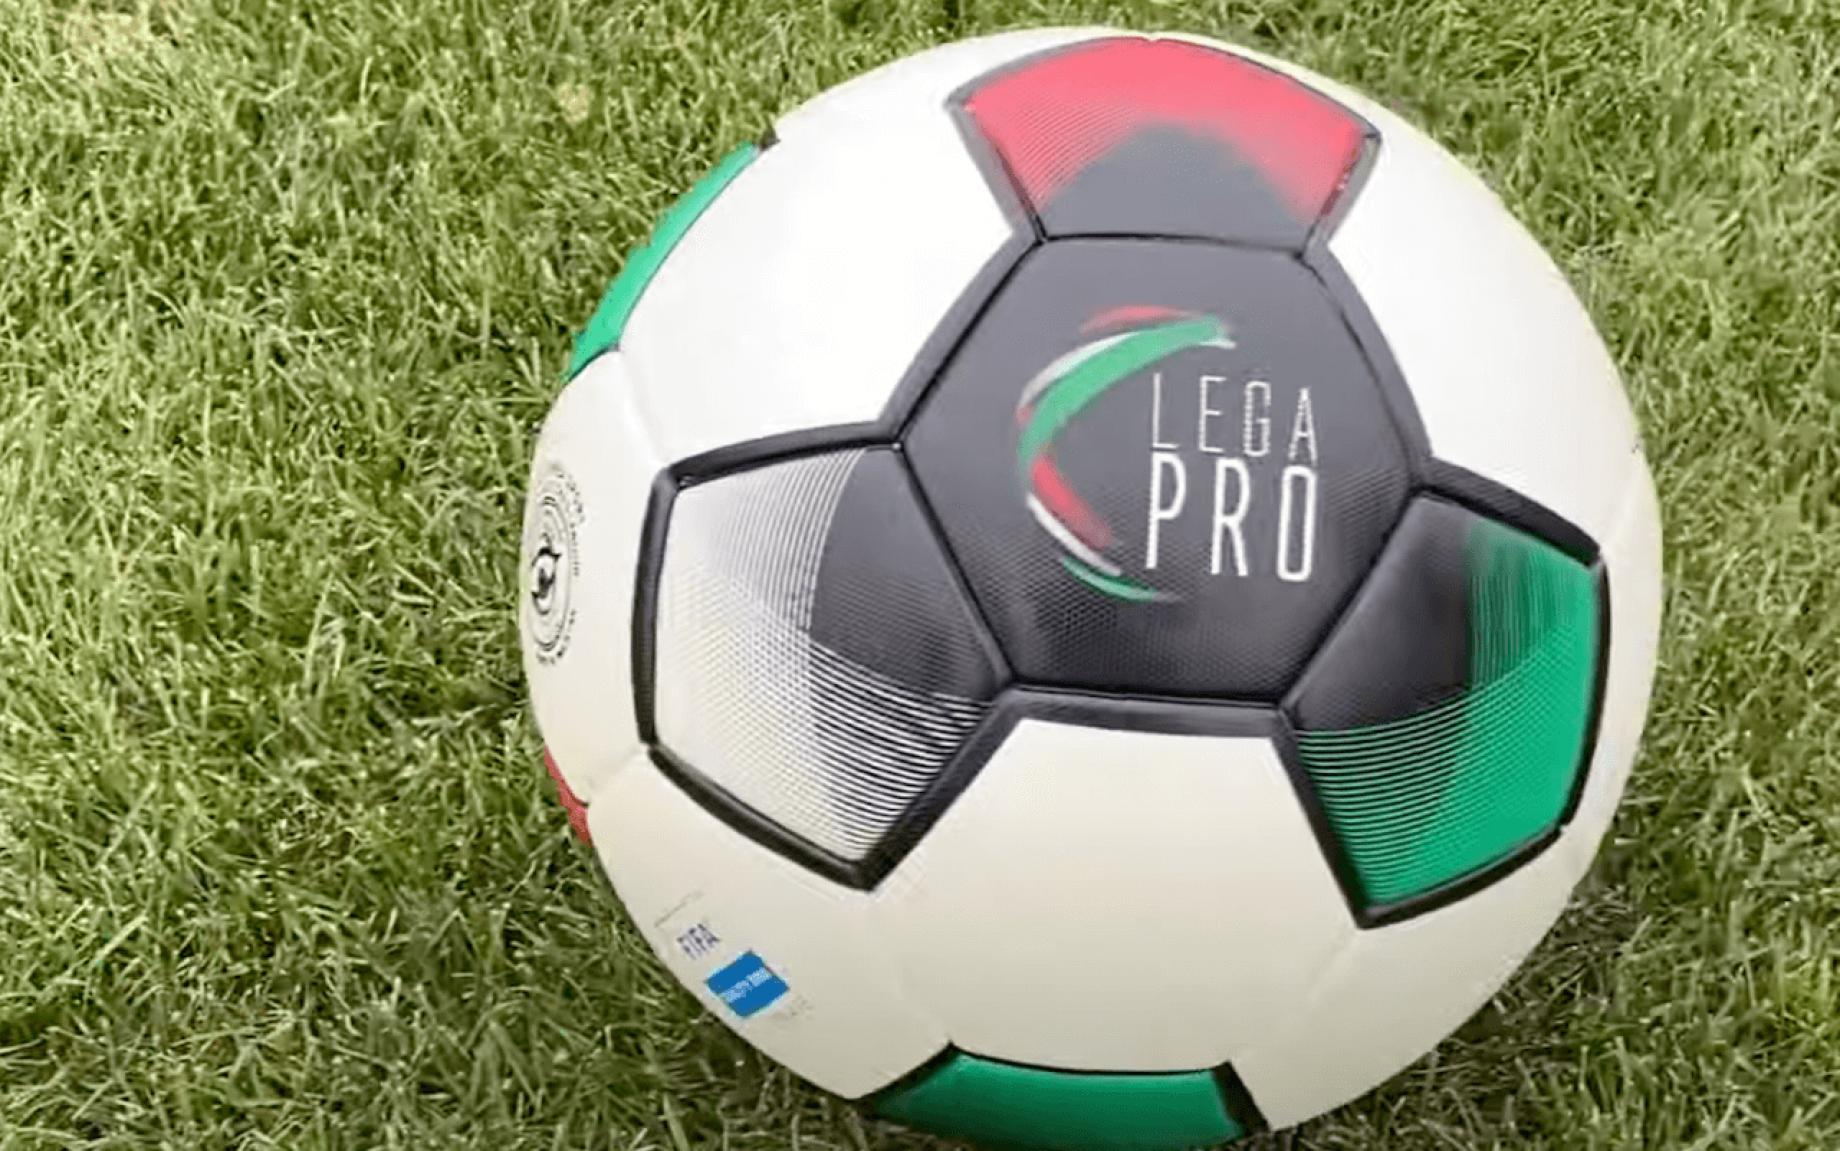 serie-c-pallone-2021-2022-screen-gpo.png